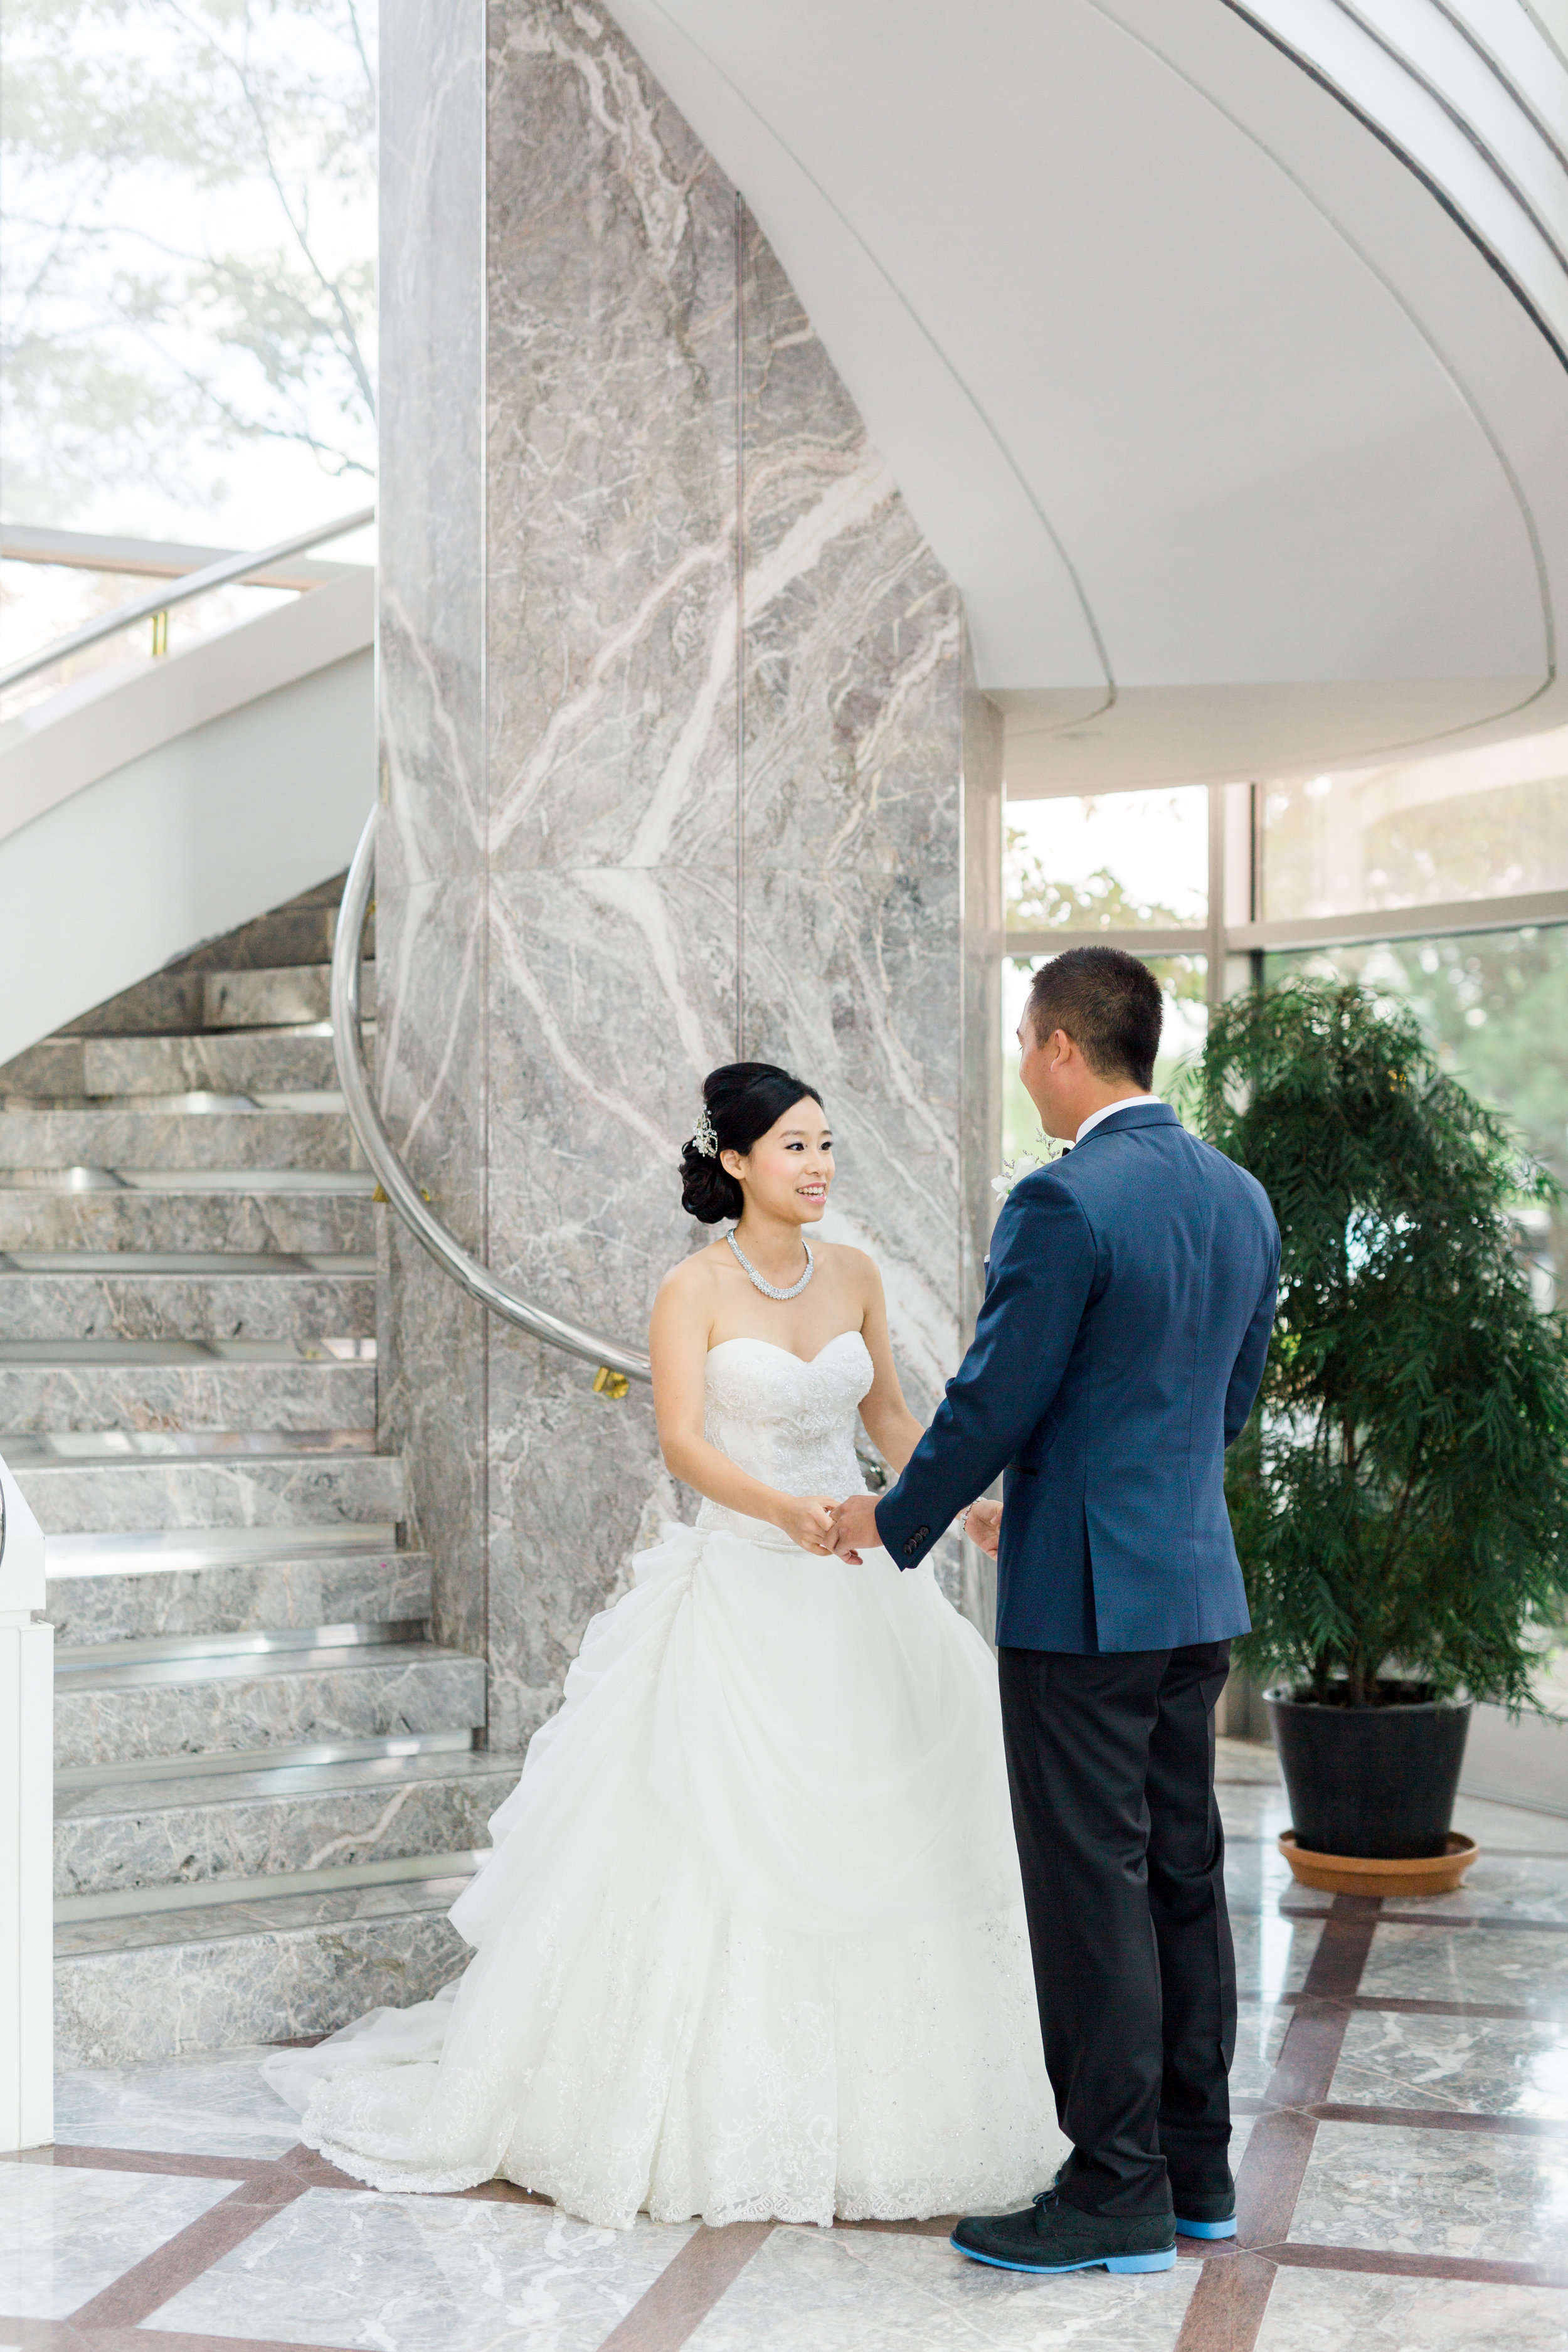 Toronto Fine Art Photographer - Hilton Markham Wedding - First Look-12.jpg